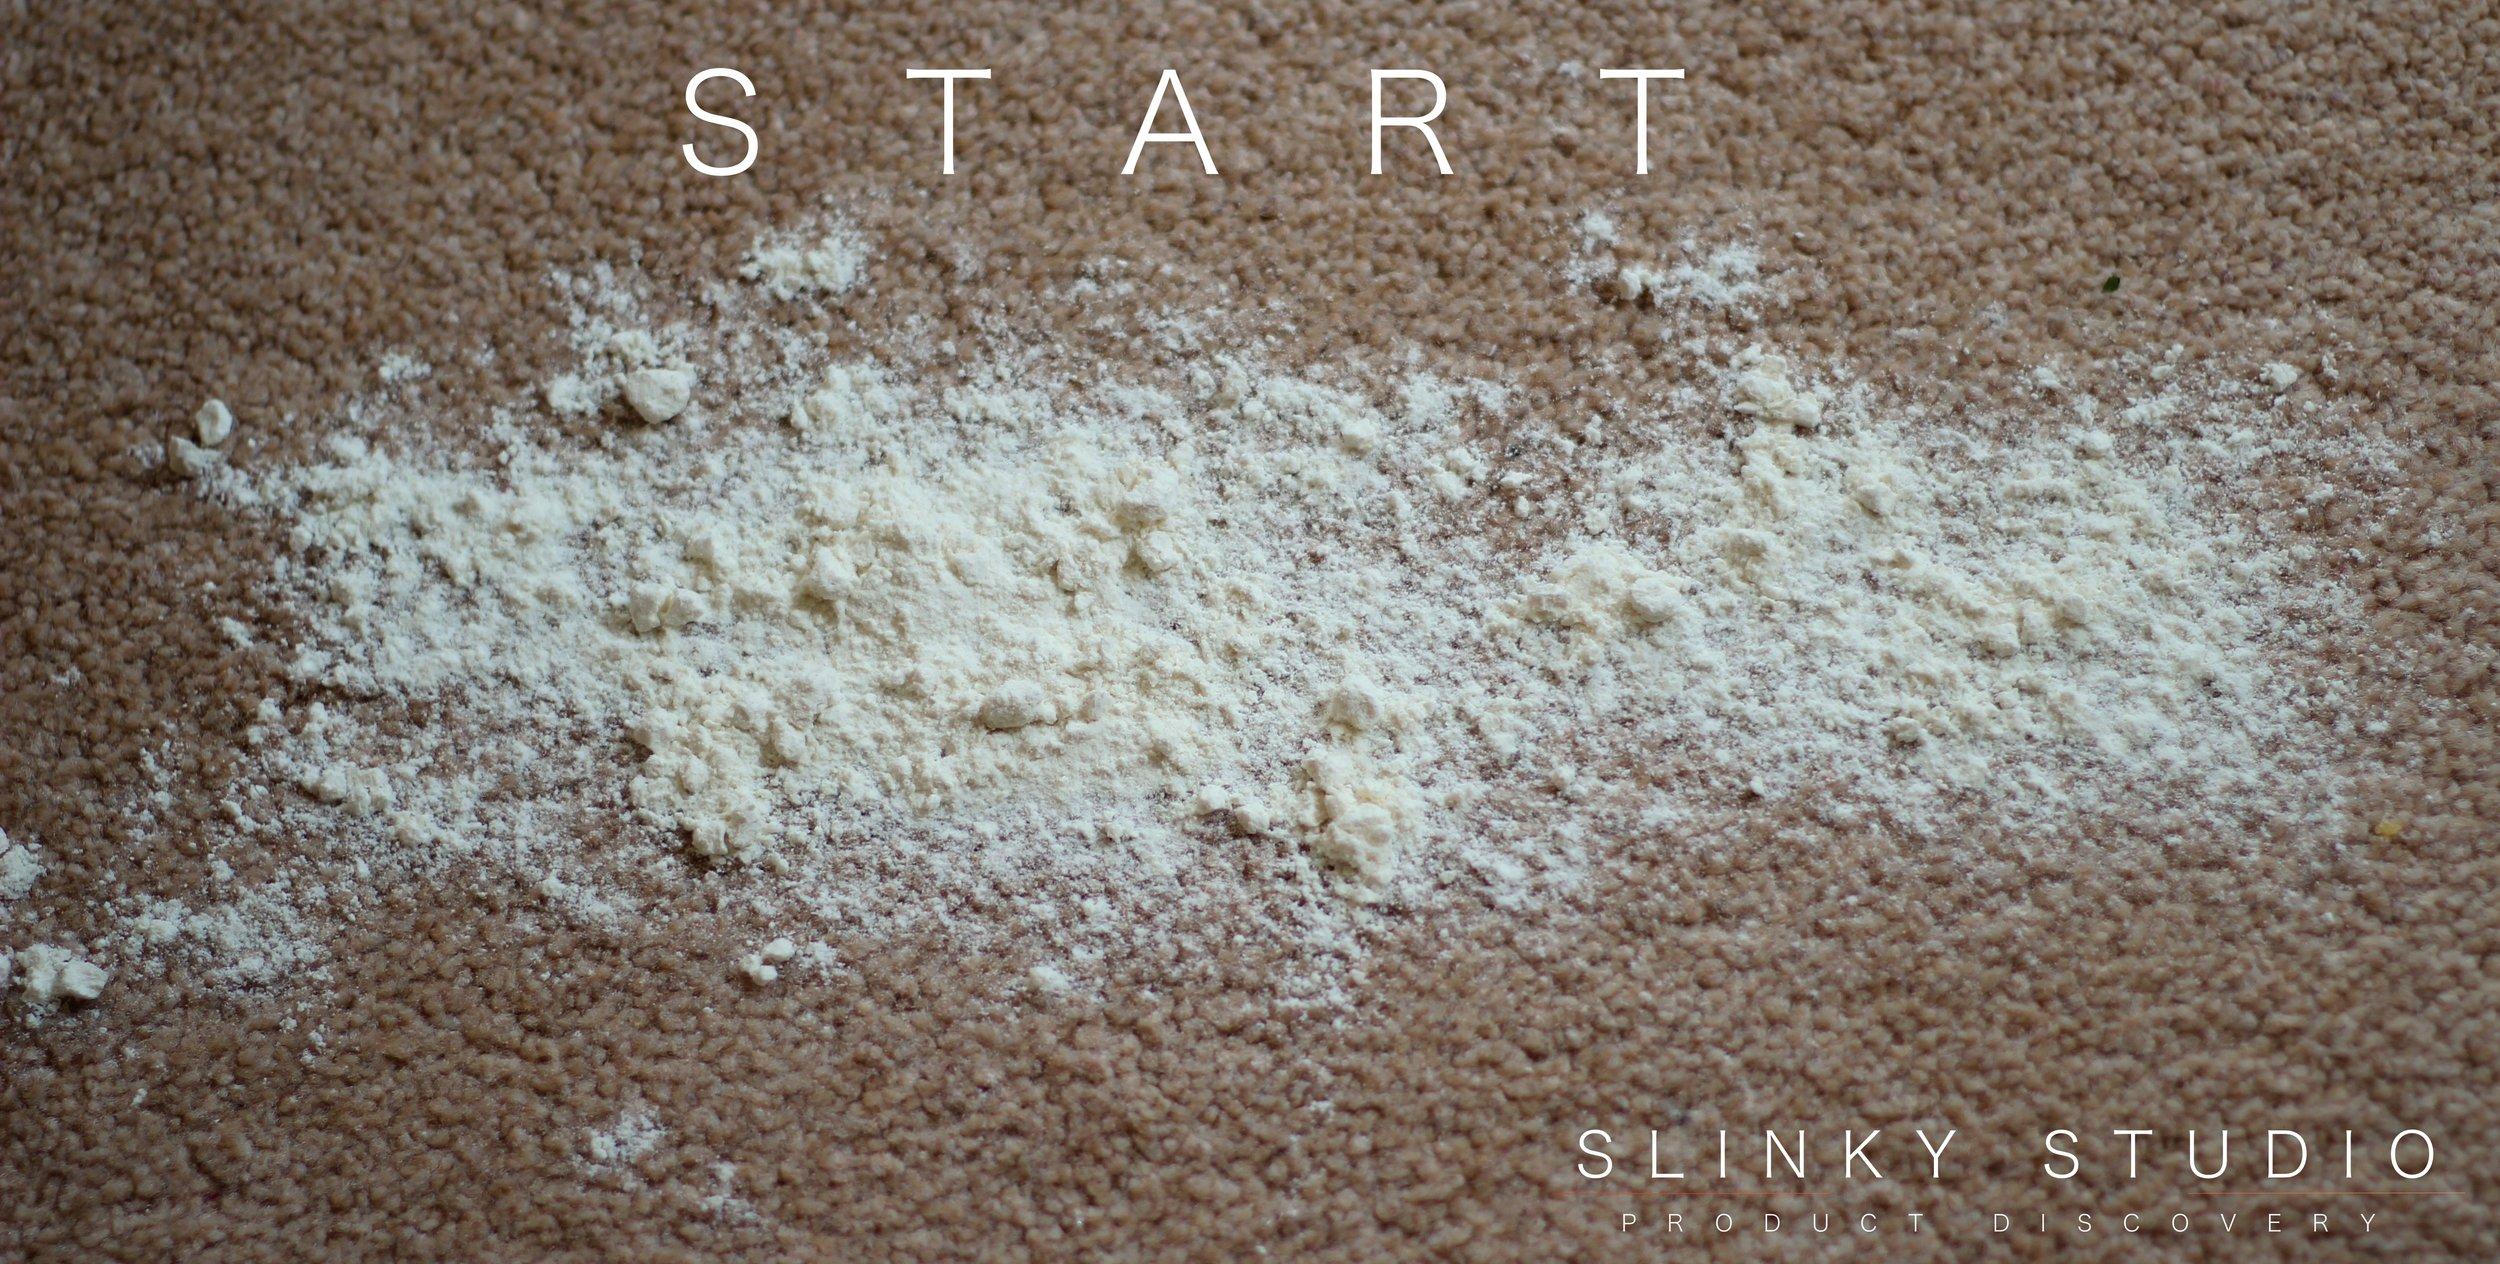 Vorwerk+Kobold+VR200+Robot+Cleaner+Carpet+Flour+Test+Start.jpg